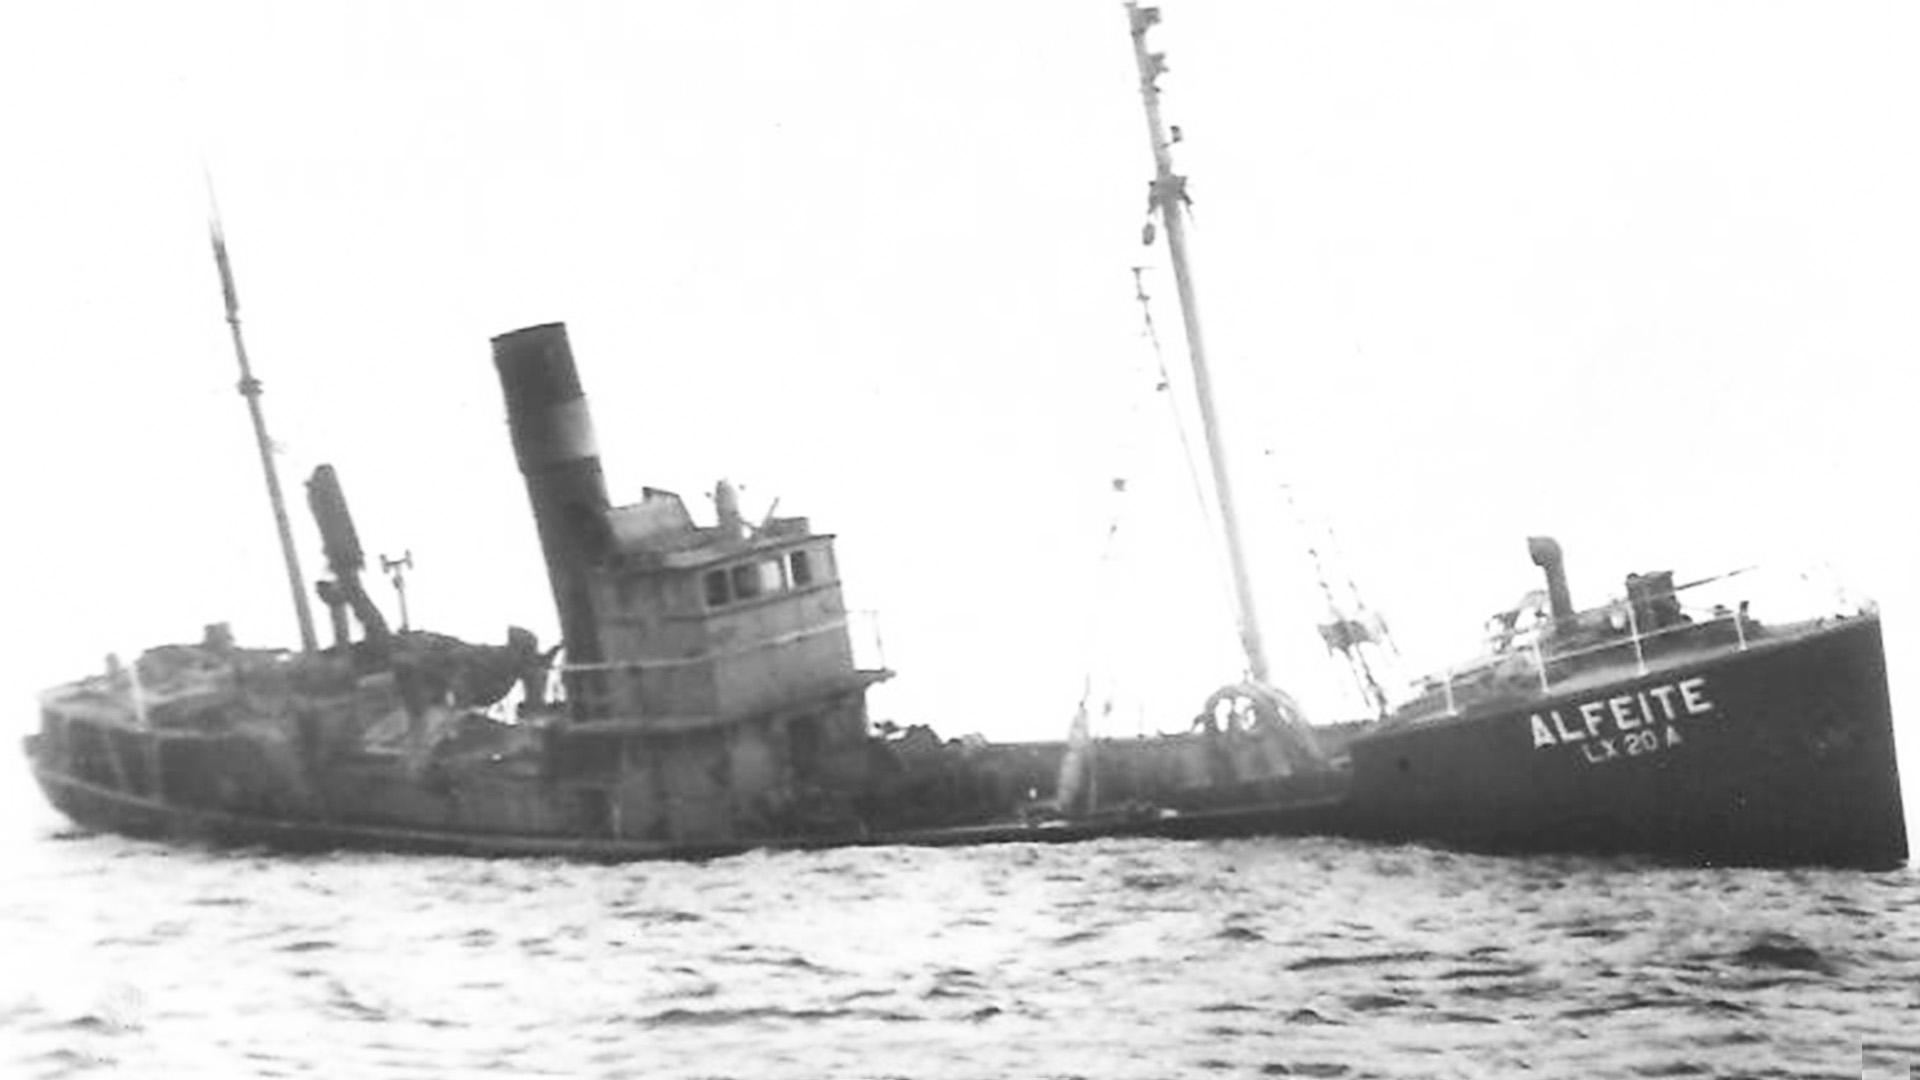 Schiffswrack der Alfeite am Playa del Castillo Caleta de Fuste.